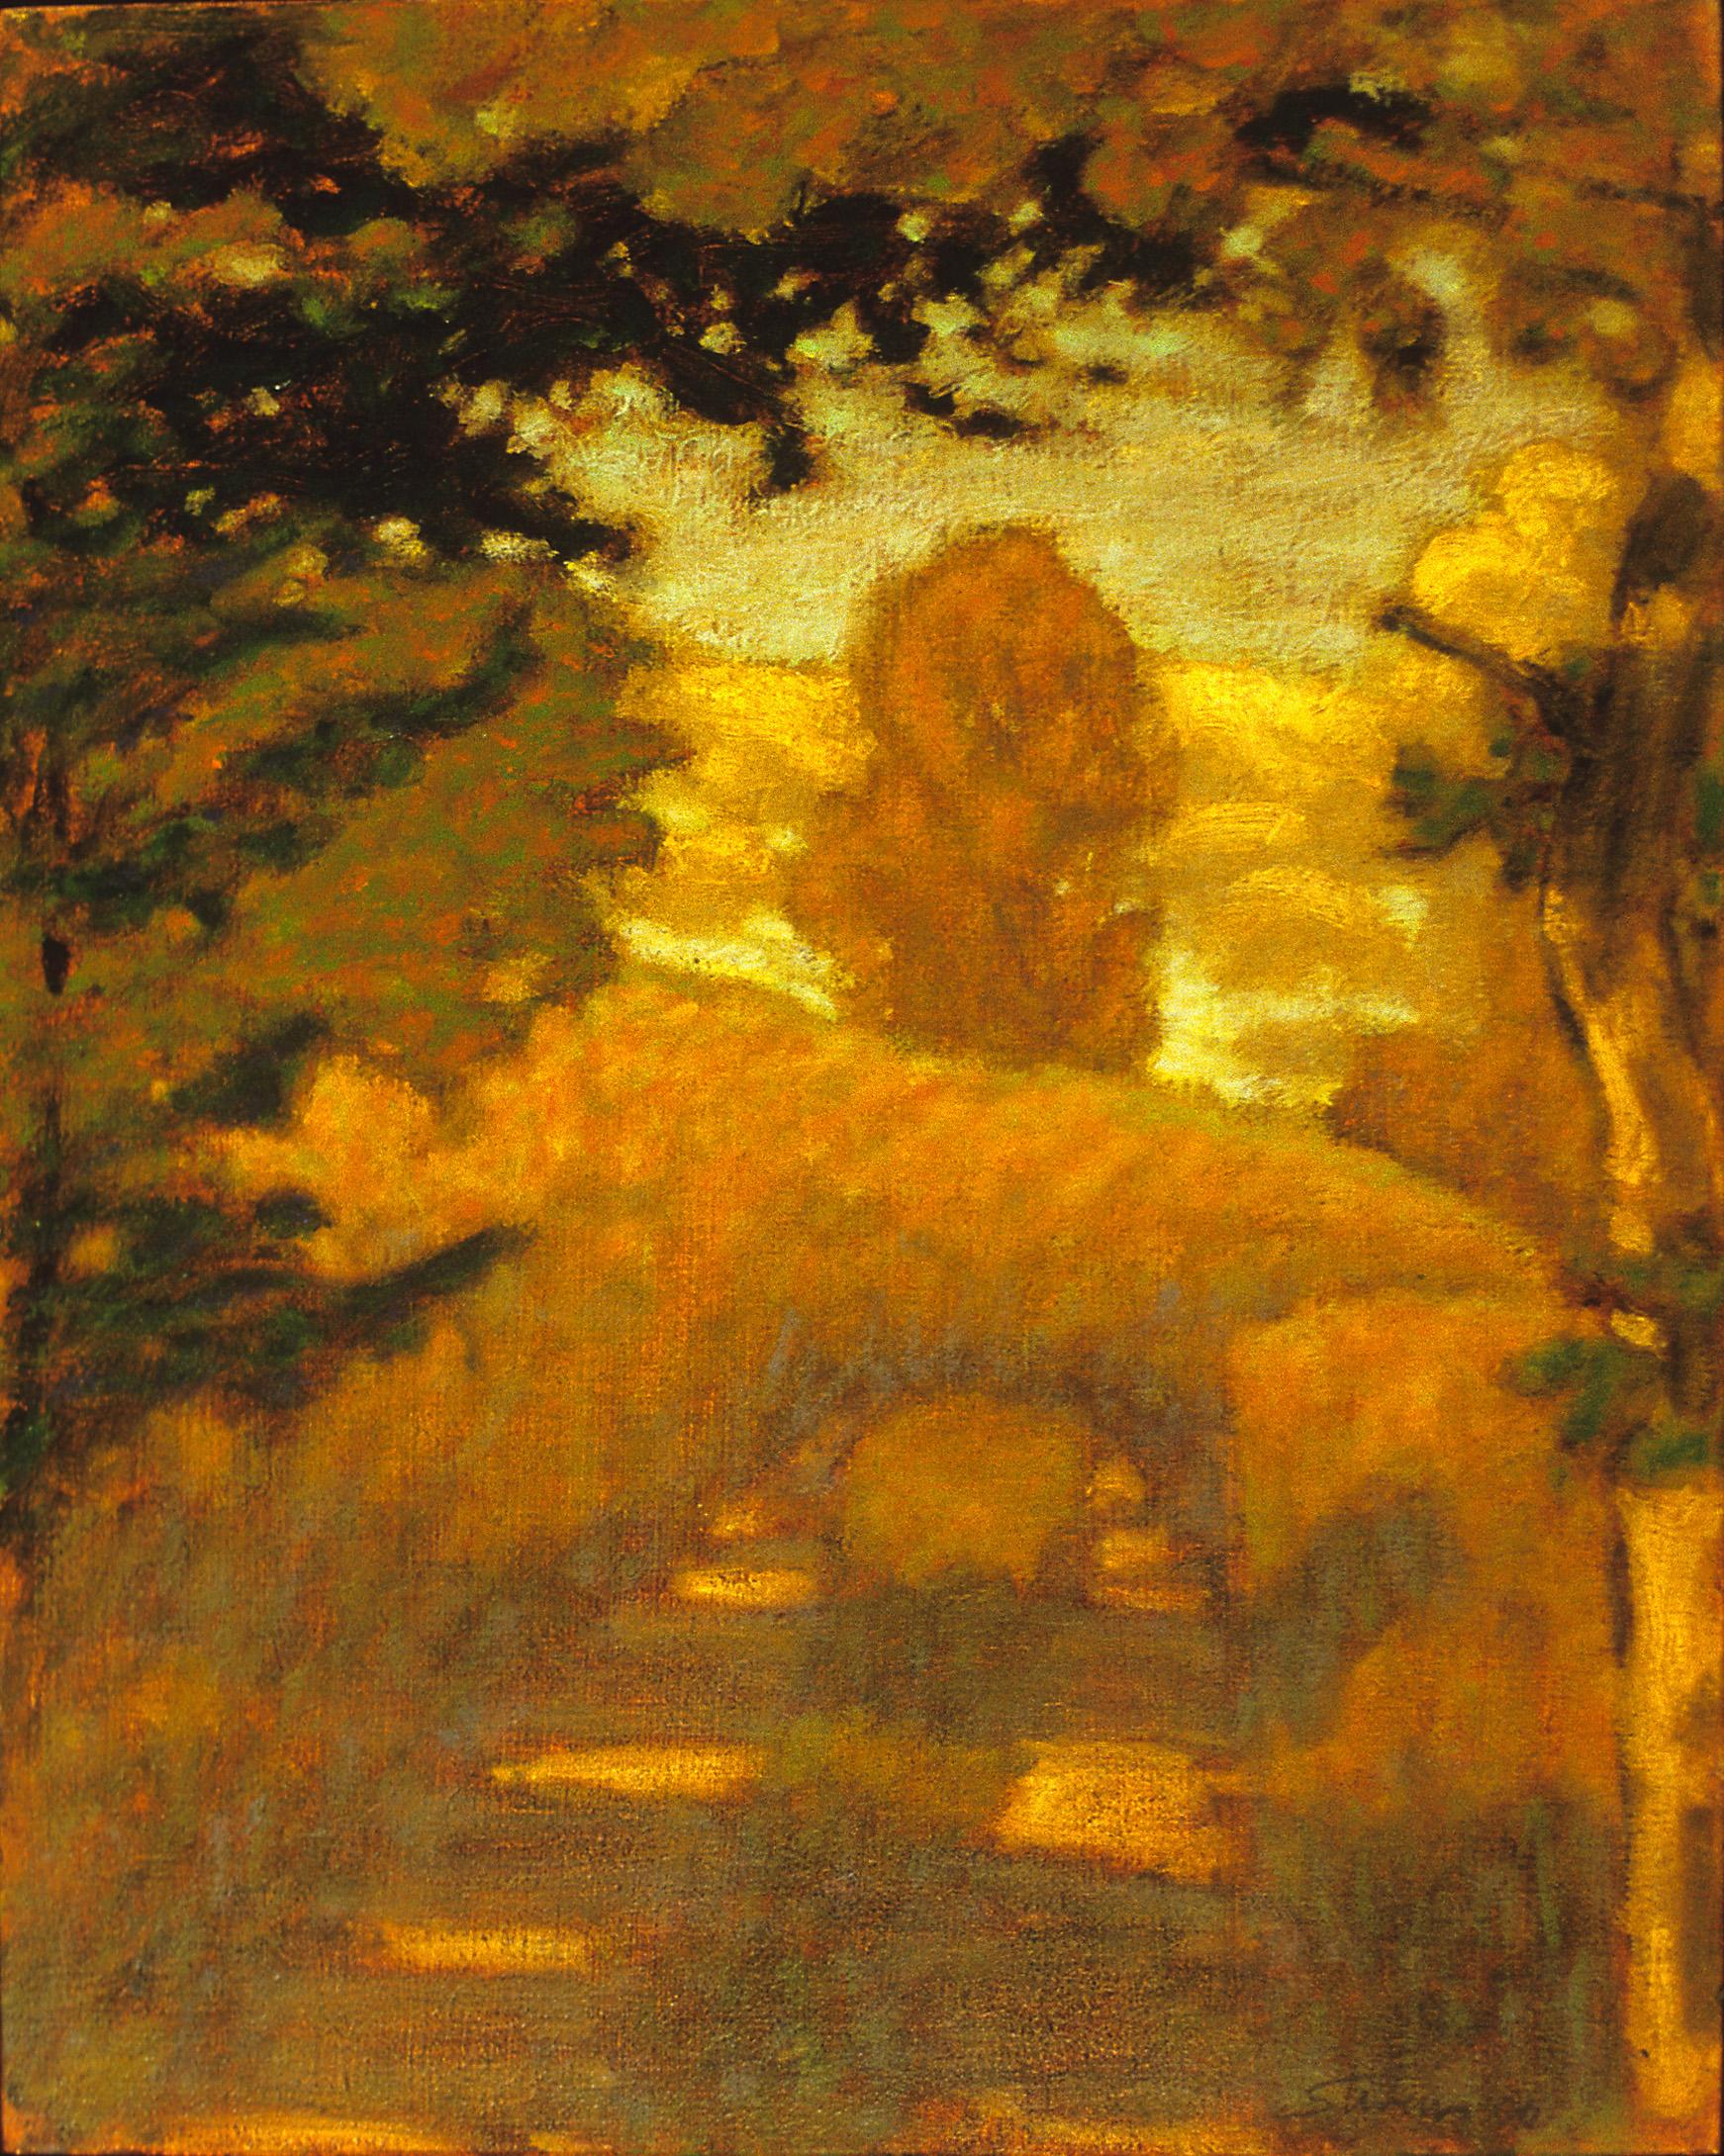 "Near Higgins Lake   | oil on canvas | 15 x 12"" | 2000"